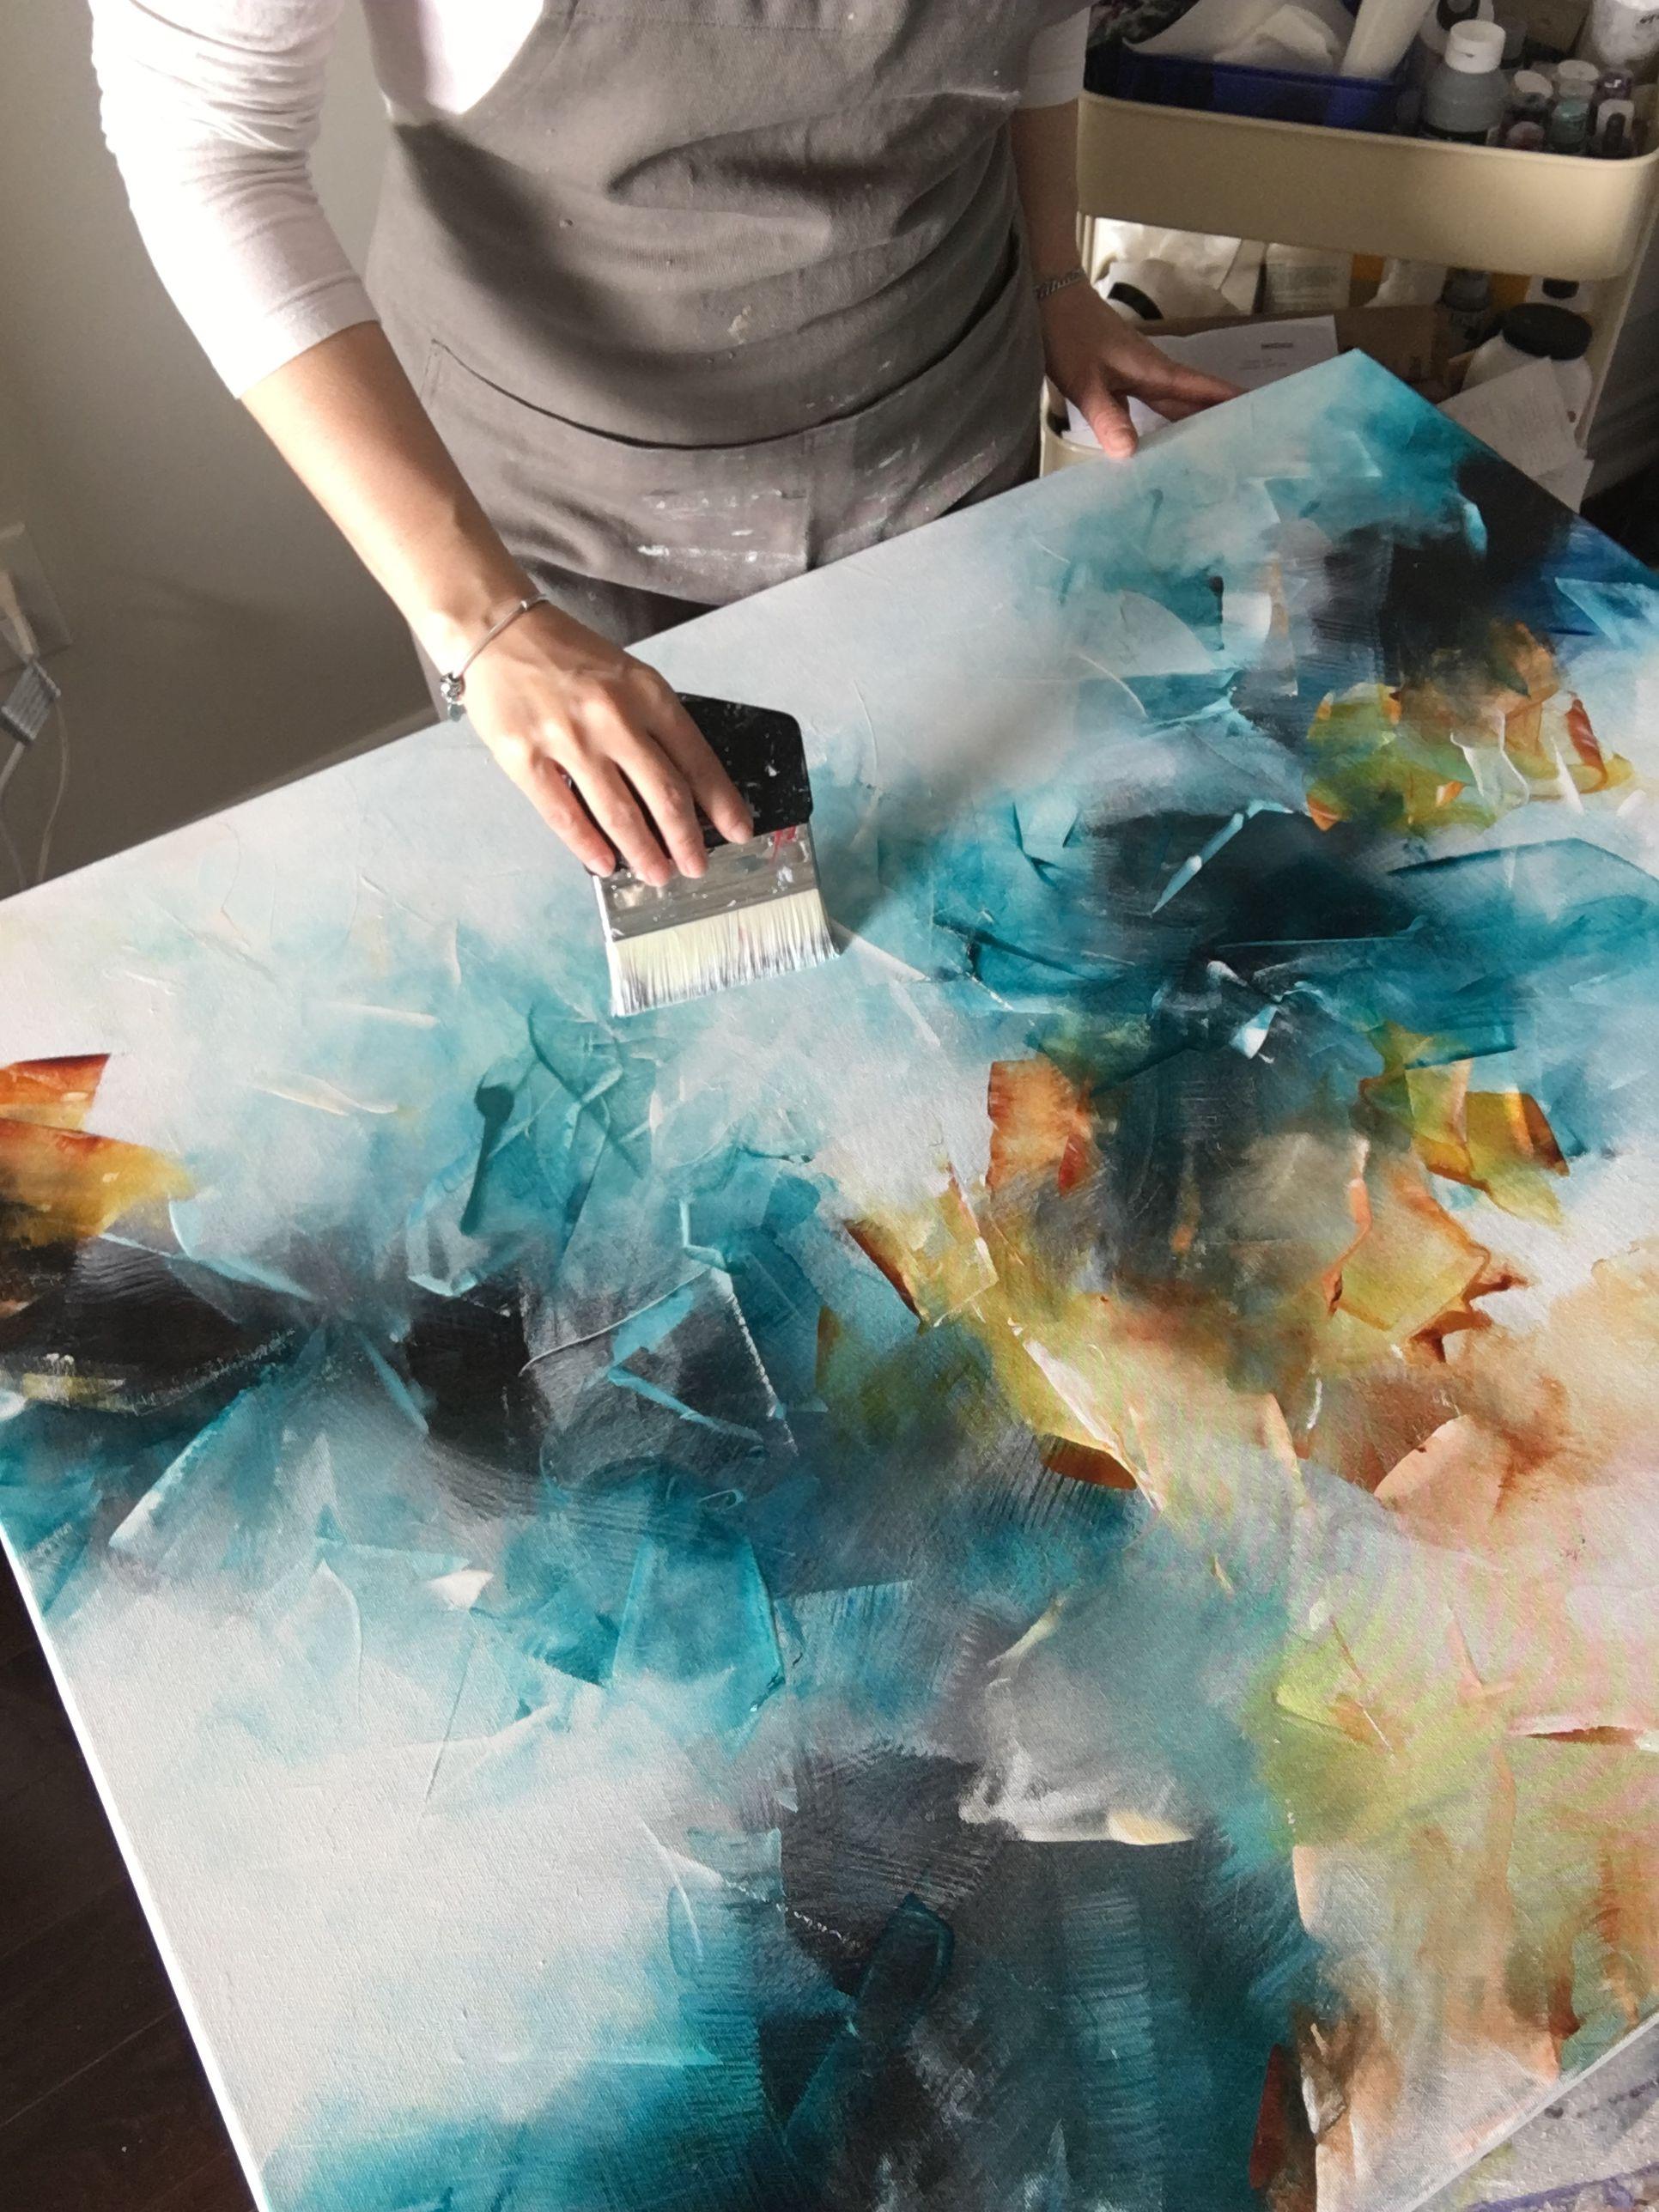 Art Studio Work In Progress - Acrylic Abstract Painting